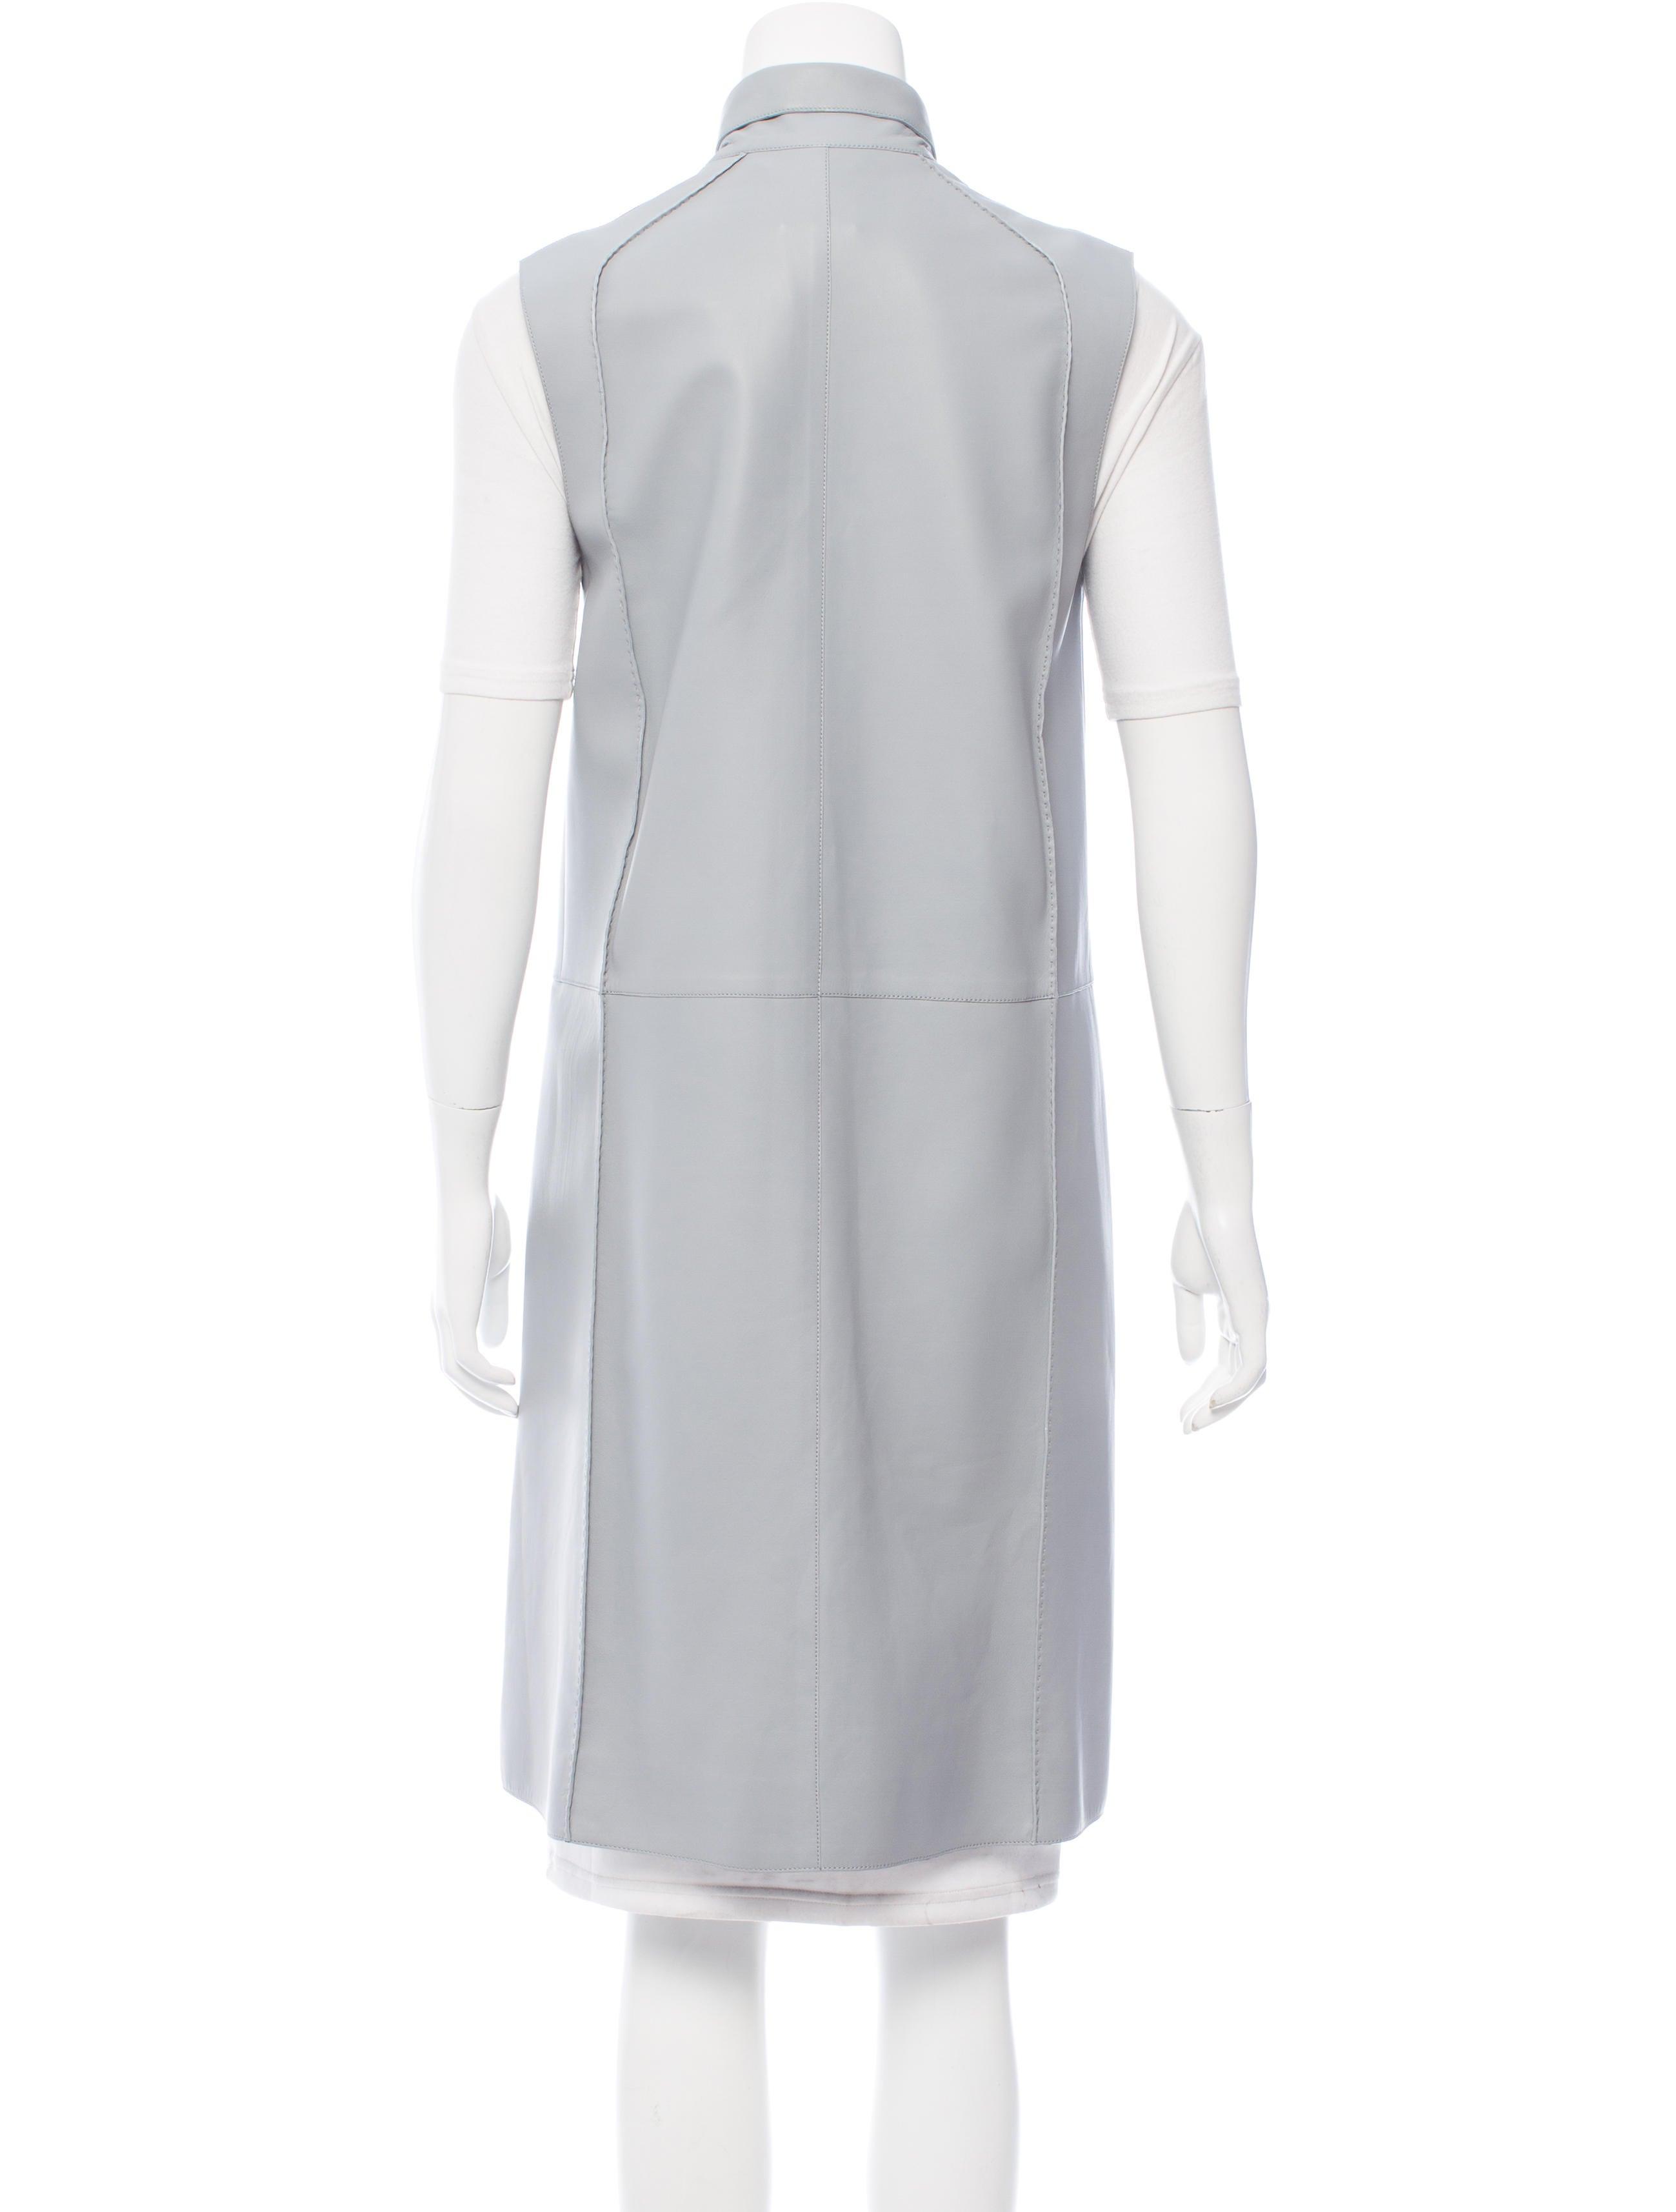 herm s leather long line vest clothing her93511 the realreal. Black Bedroom Furniture Sets. Home Design Ideas